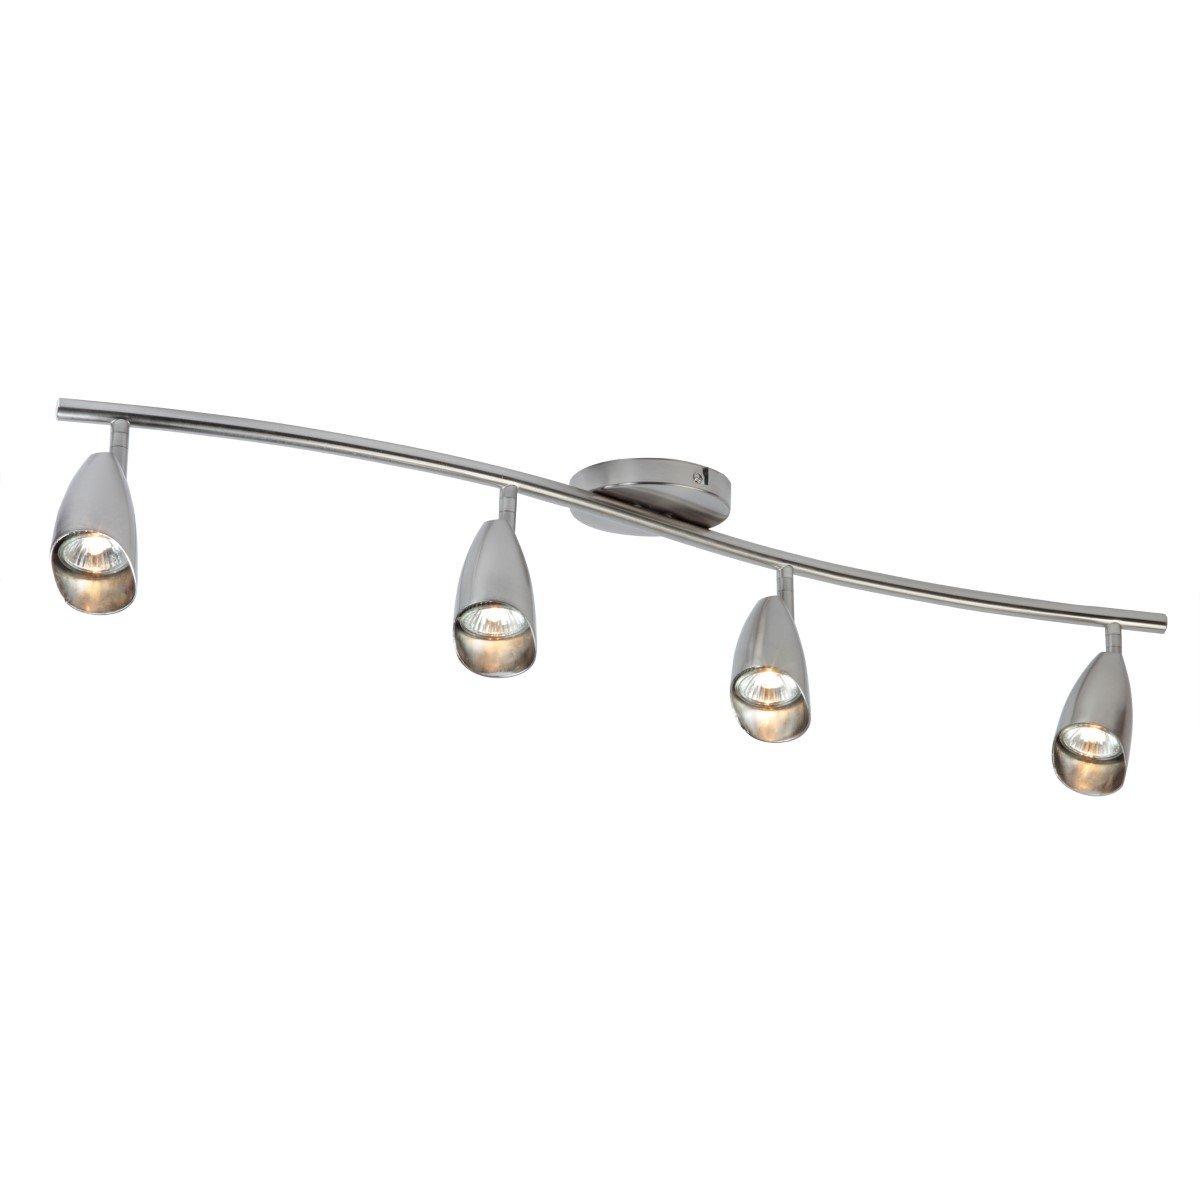 Globe Electric Grayson 4-Light S-Shape Track Lighting Kit, Brushed Steel Finish, 4 Bulbs Included, 59066